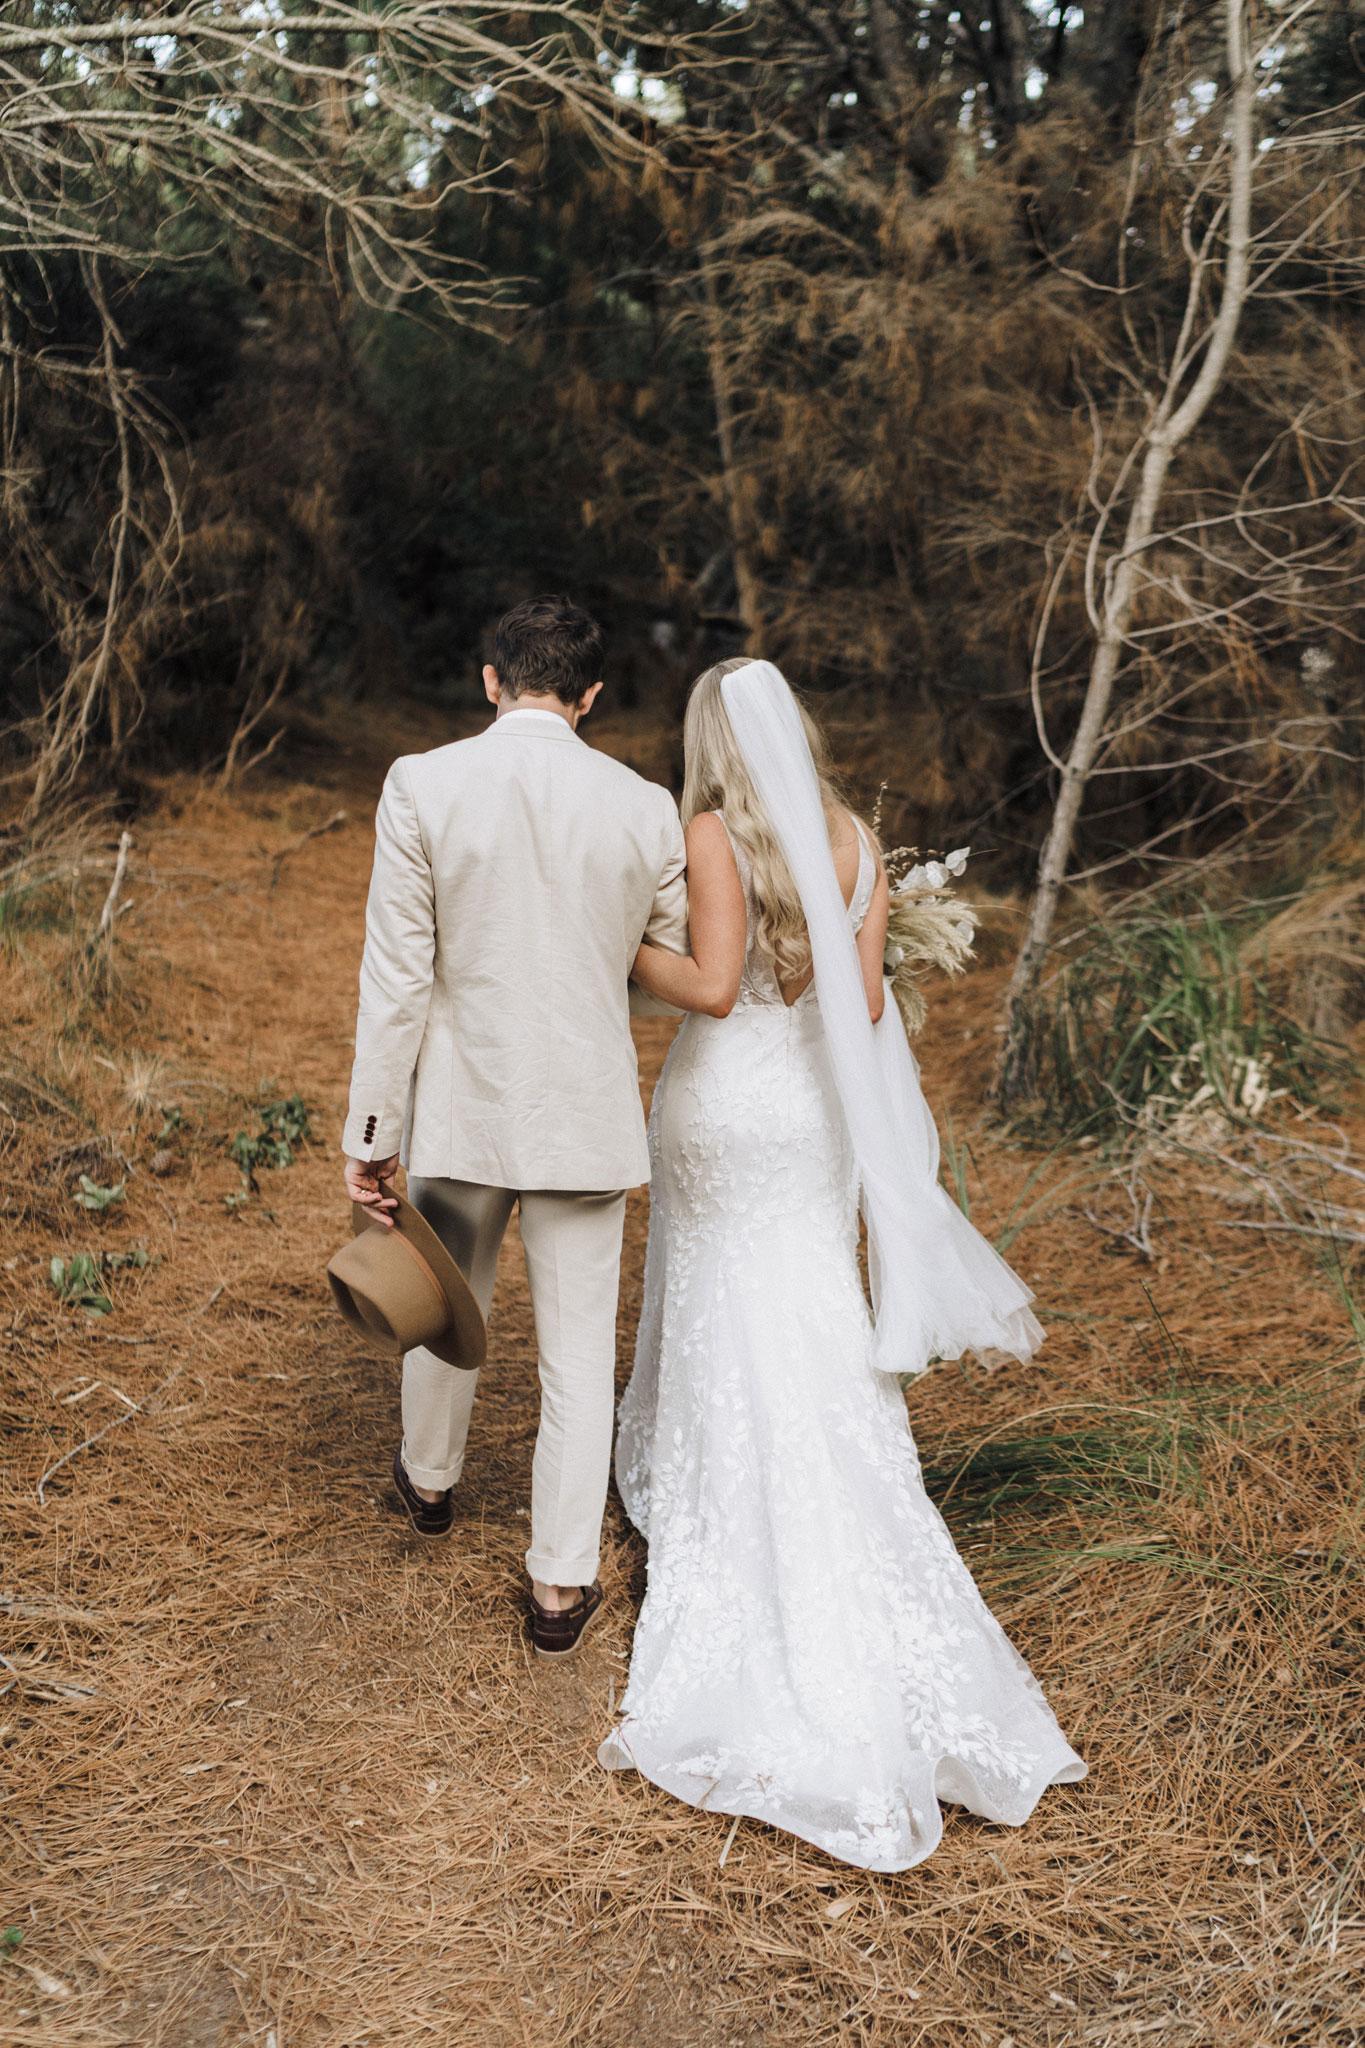 newfound-k-b-coromandel-wedding-photographers-070